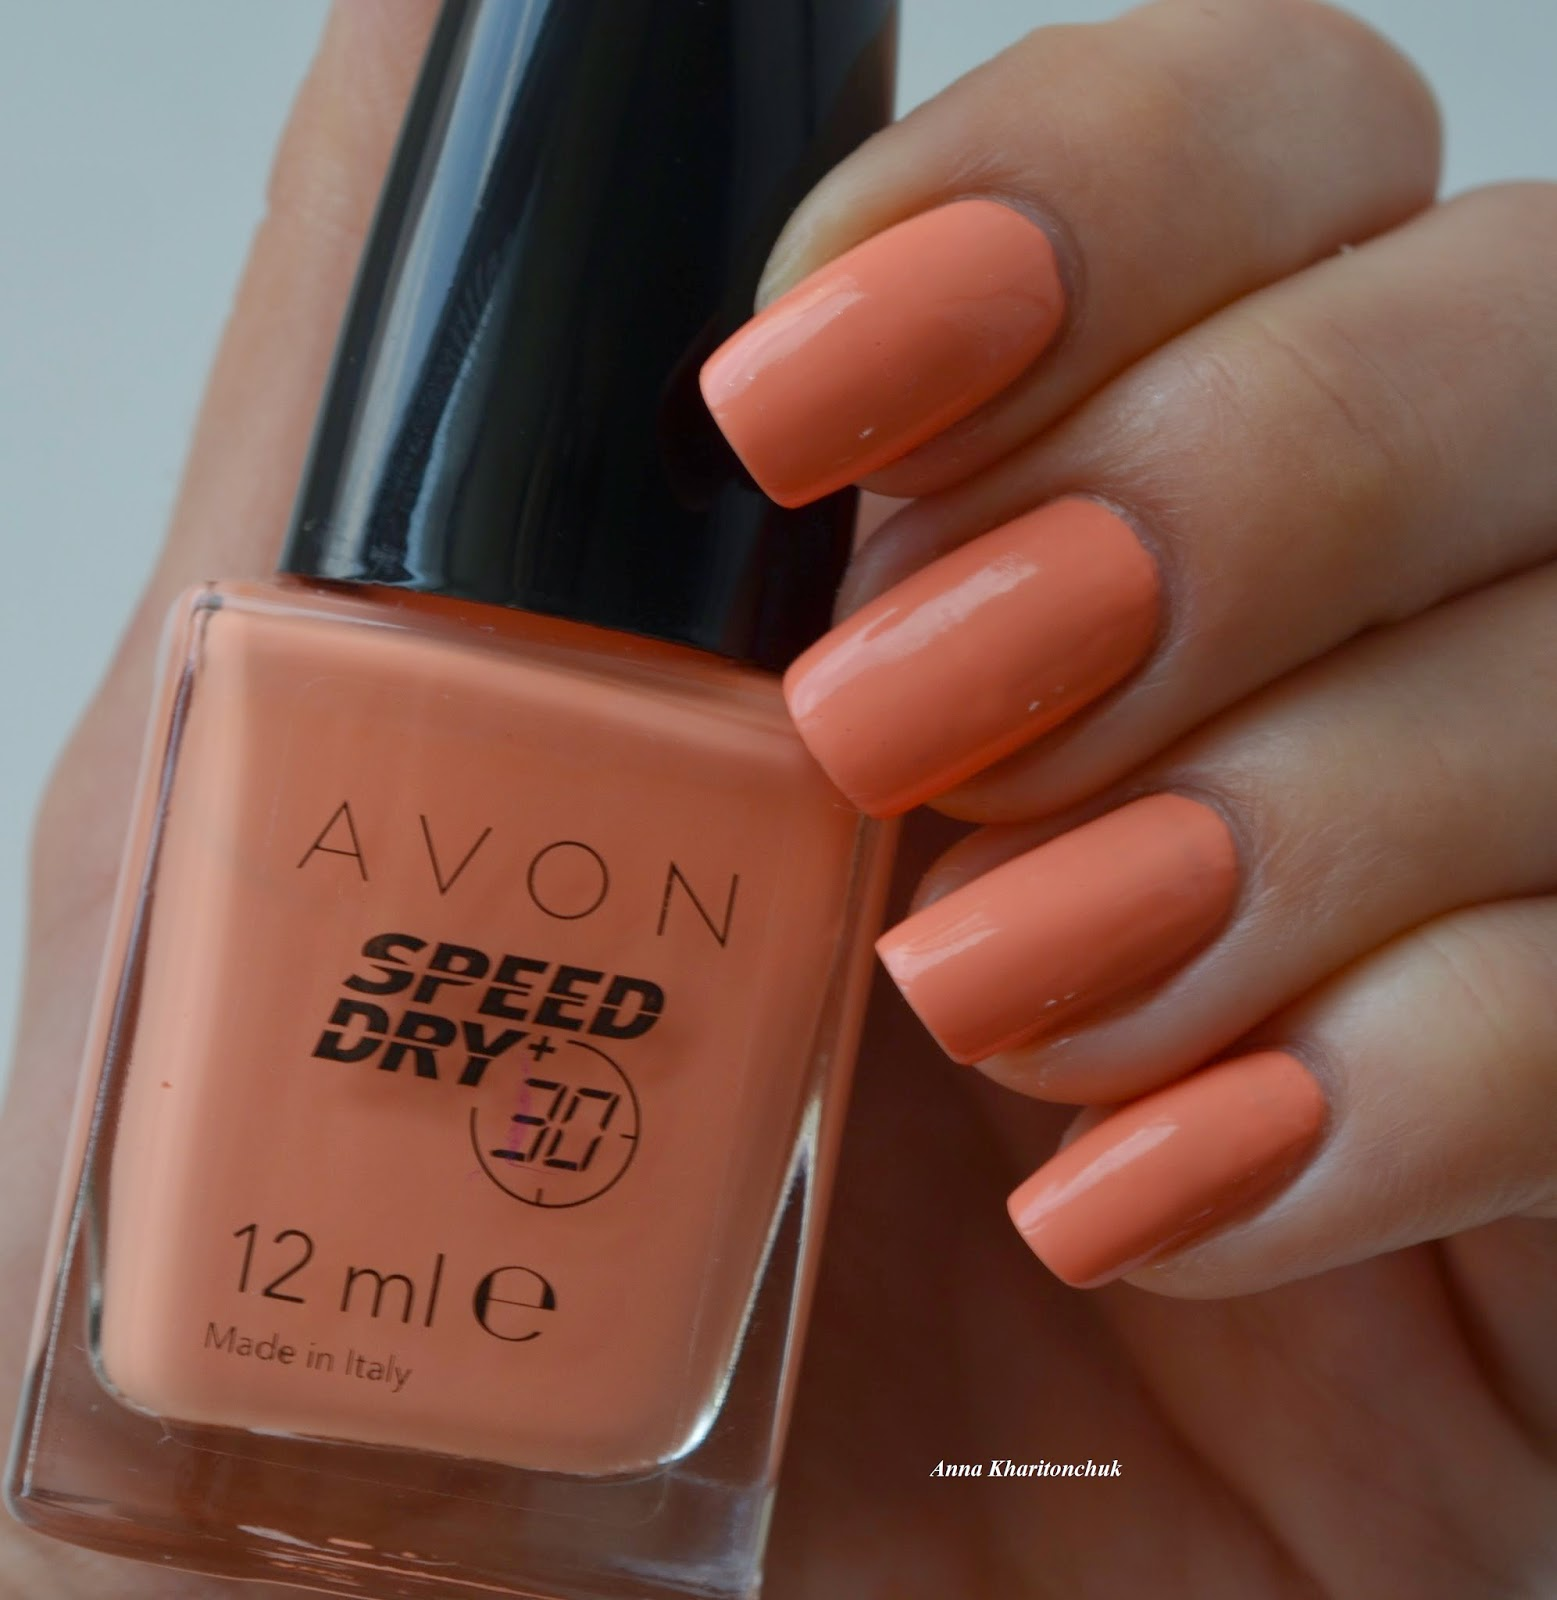 Avon Speed Dry Swift Sherbet